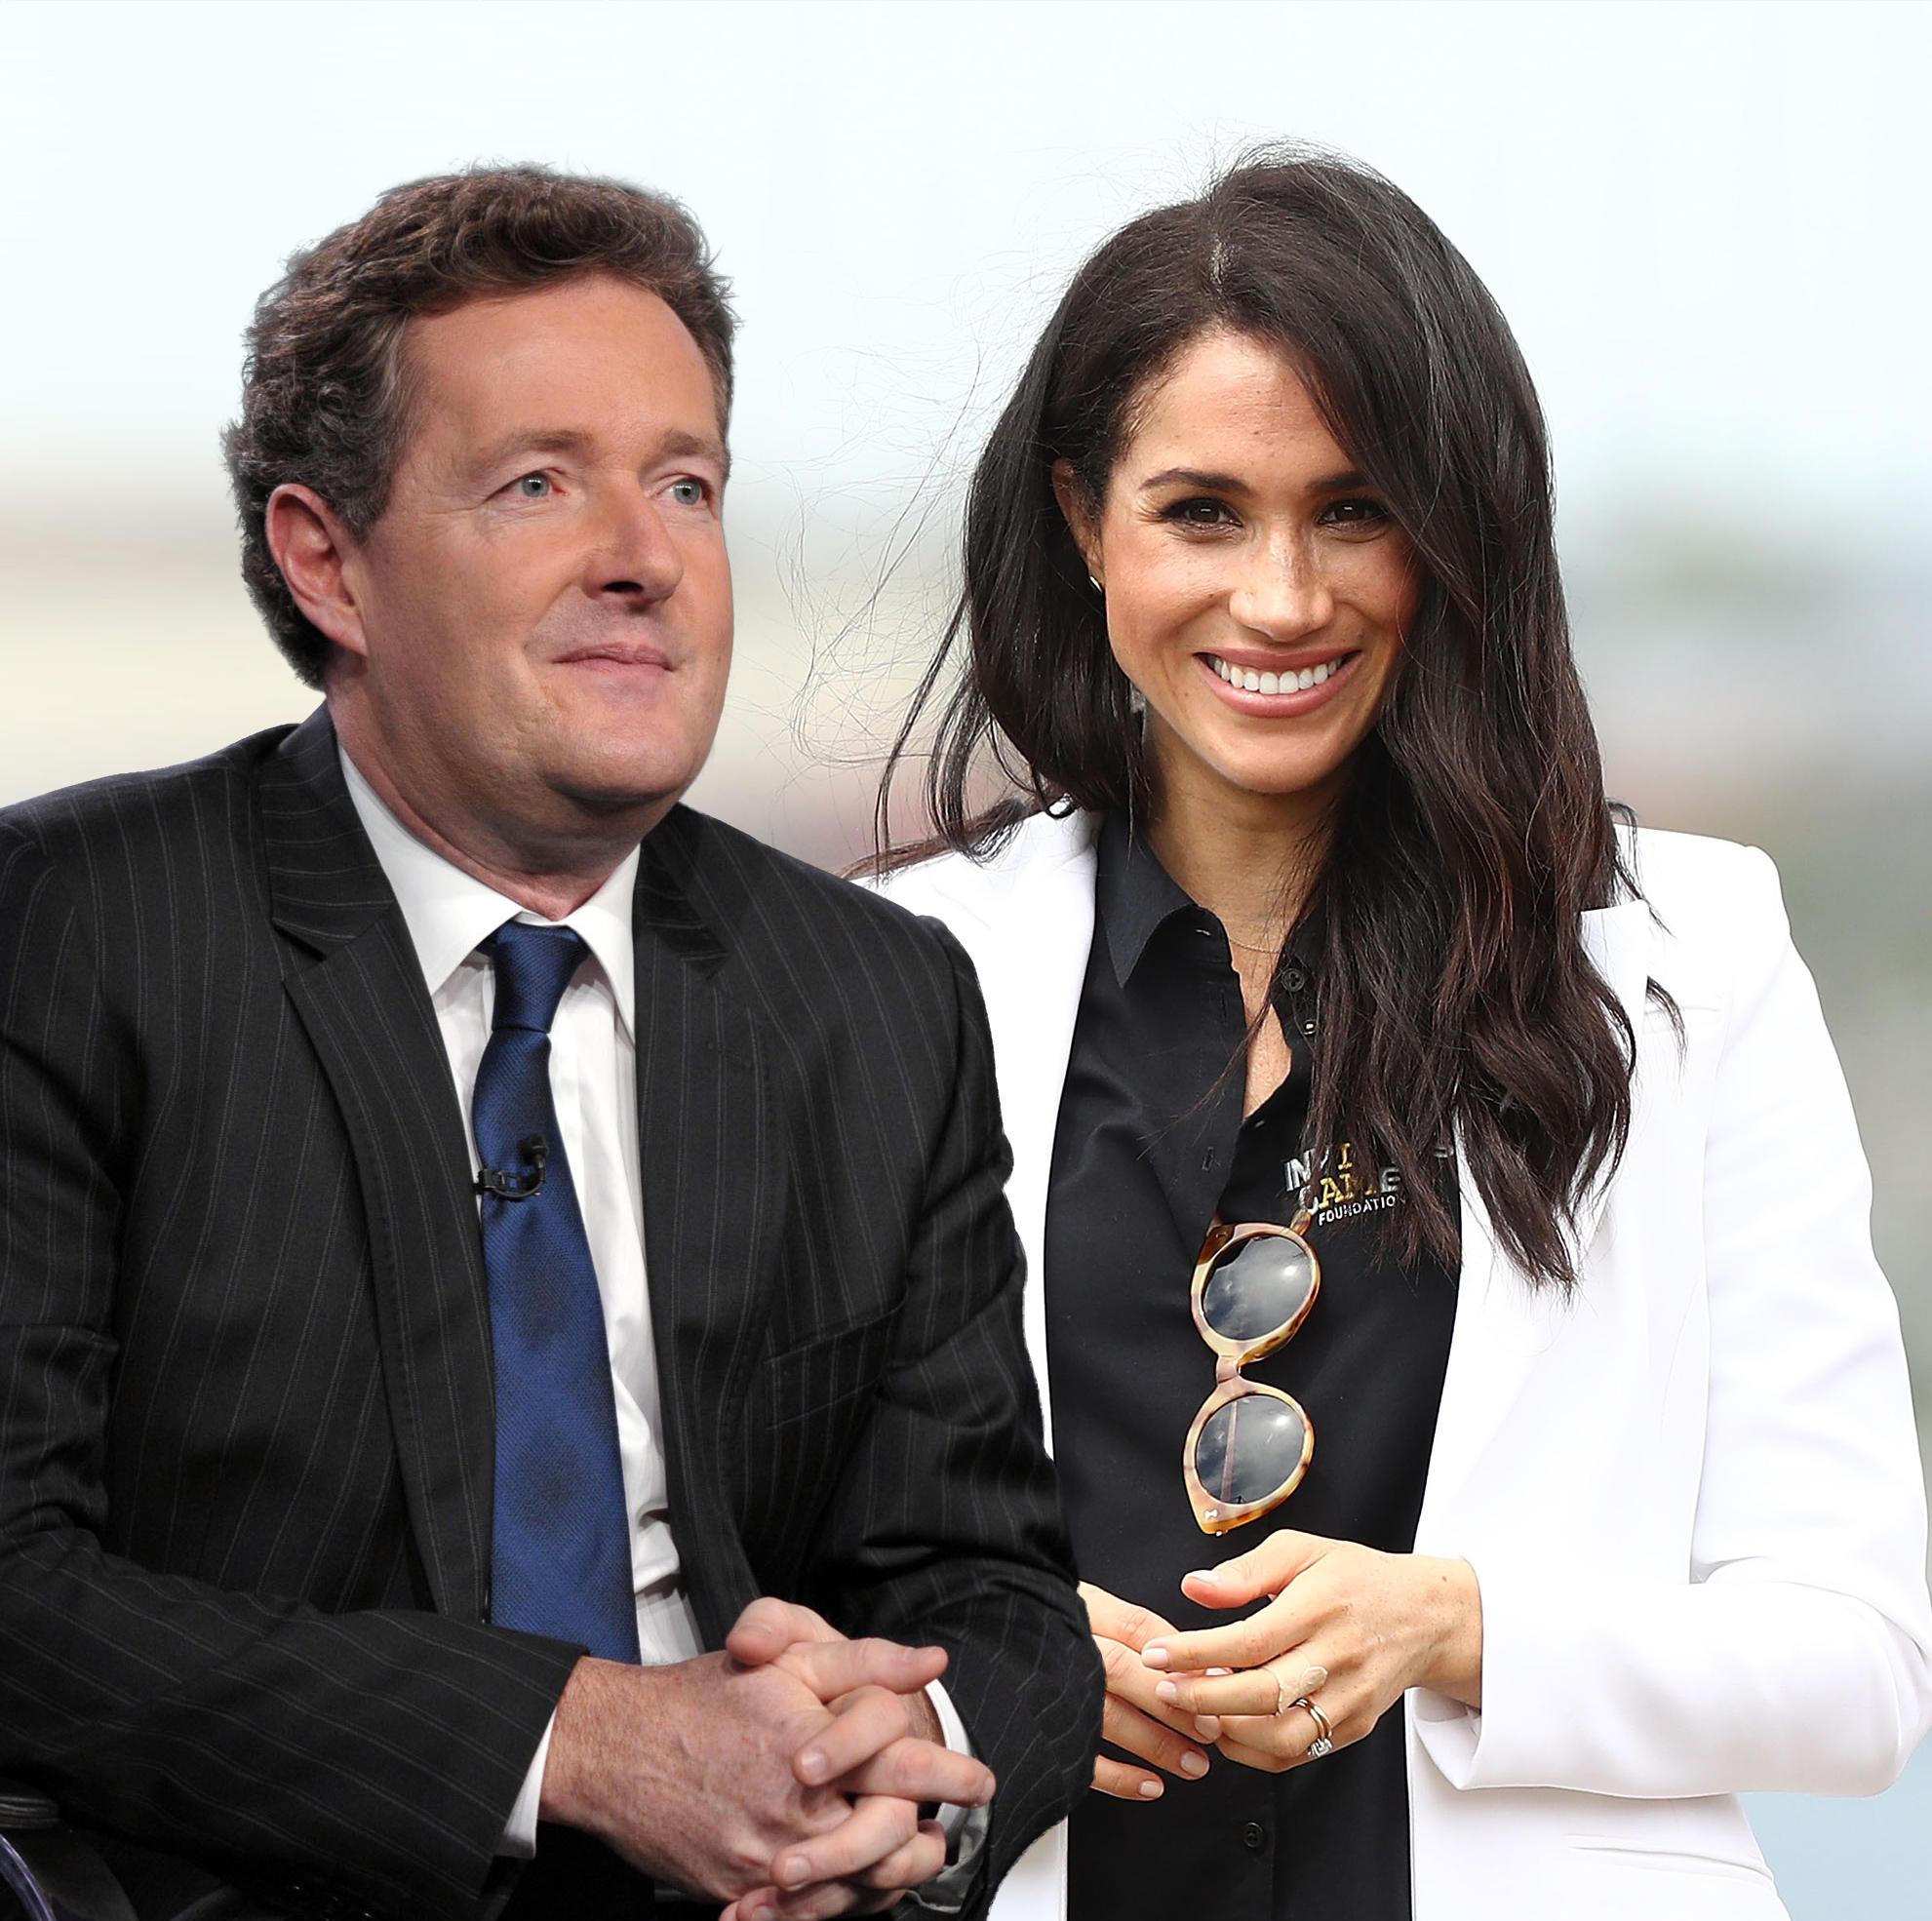 Piers Morgan, Herzogin Meghan